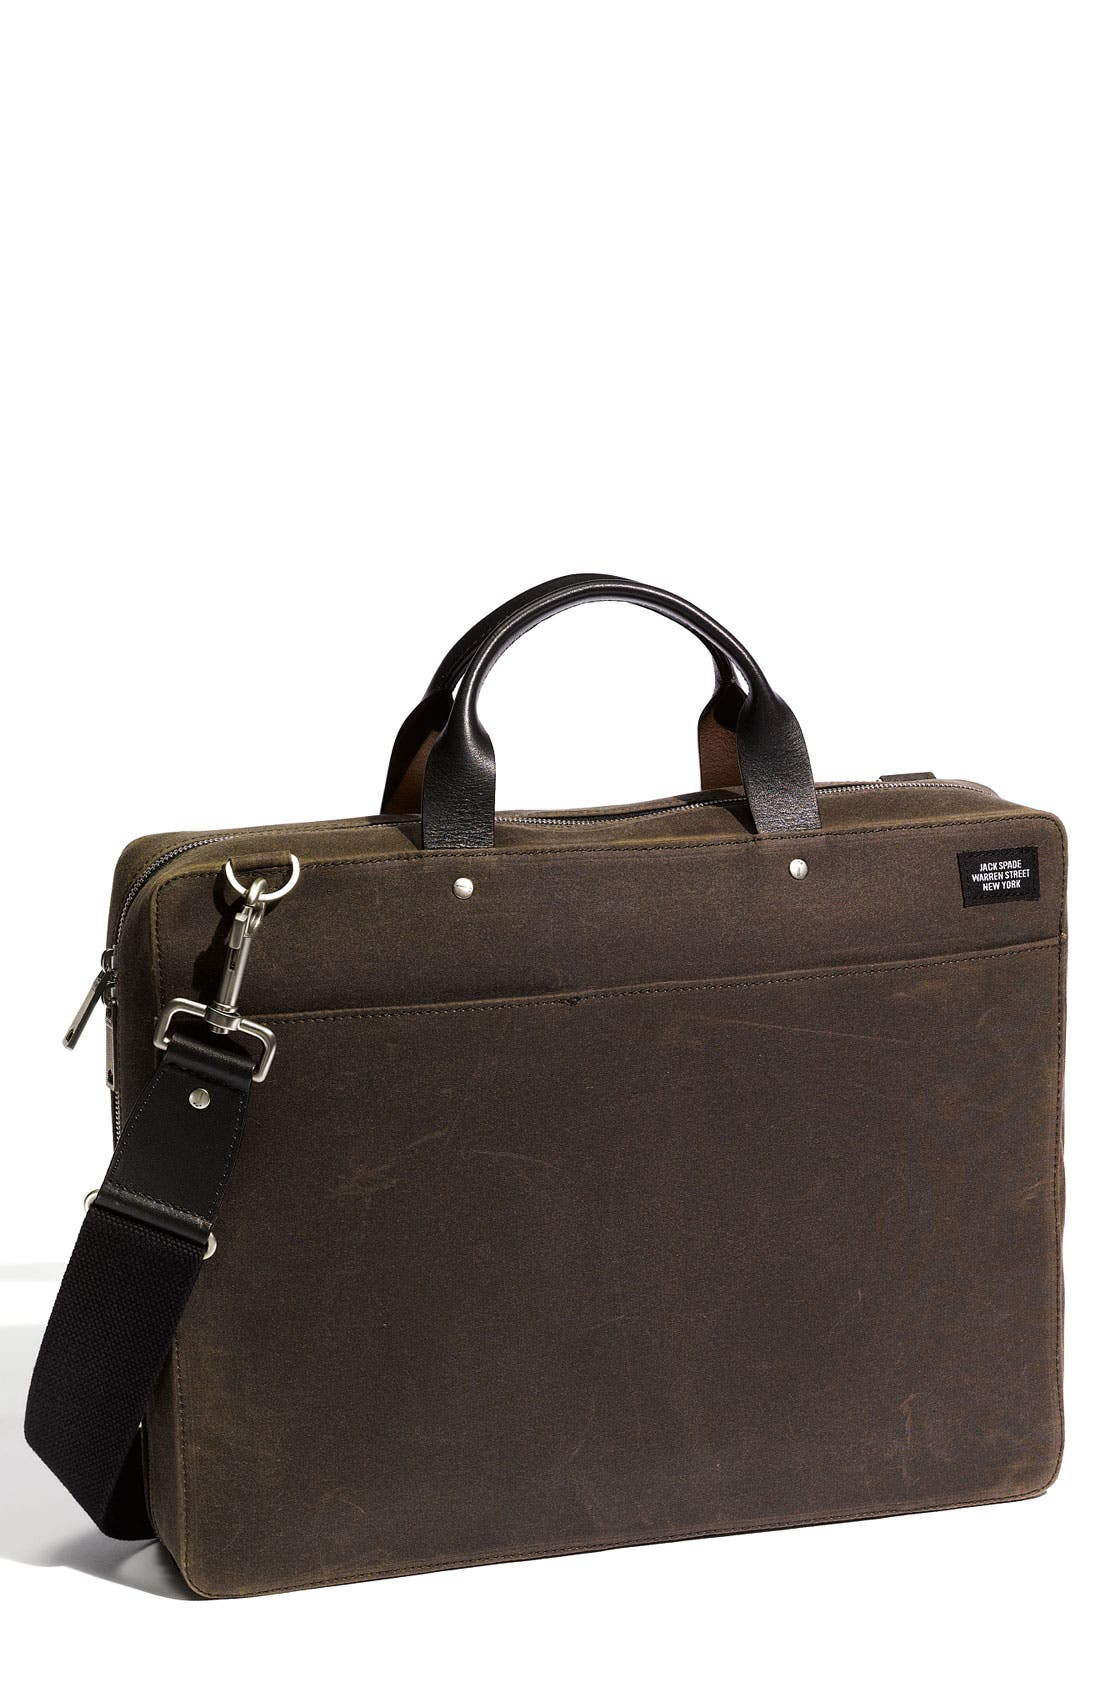 Alternate Image 1 Selected - Jack Spade 'Waxwear' Laptop File Case